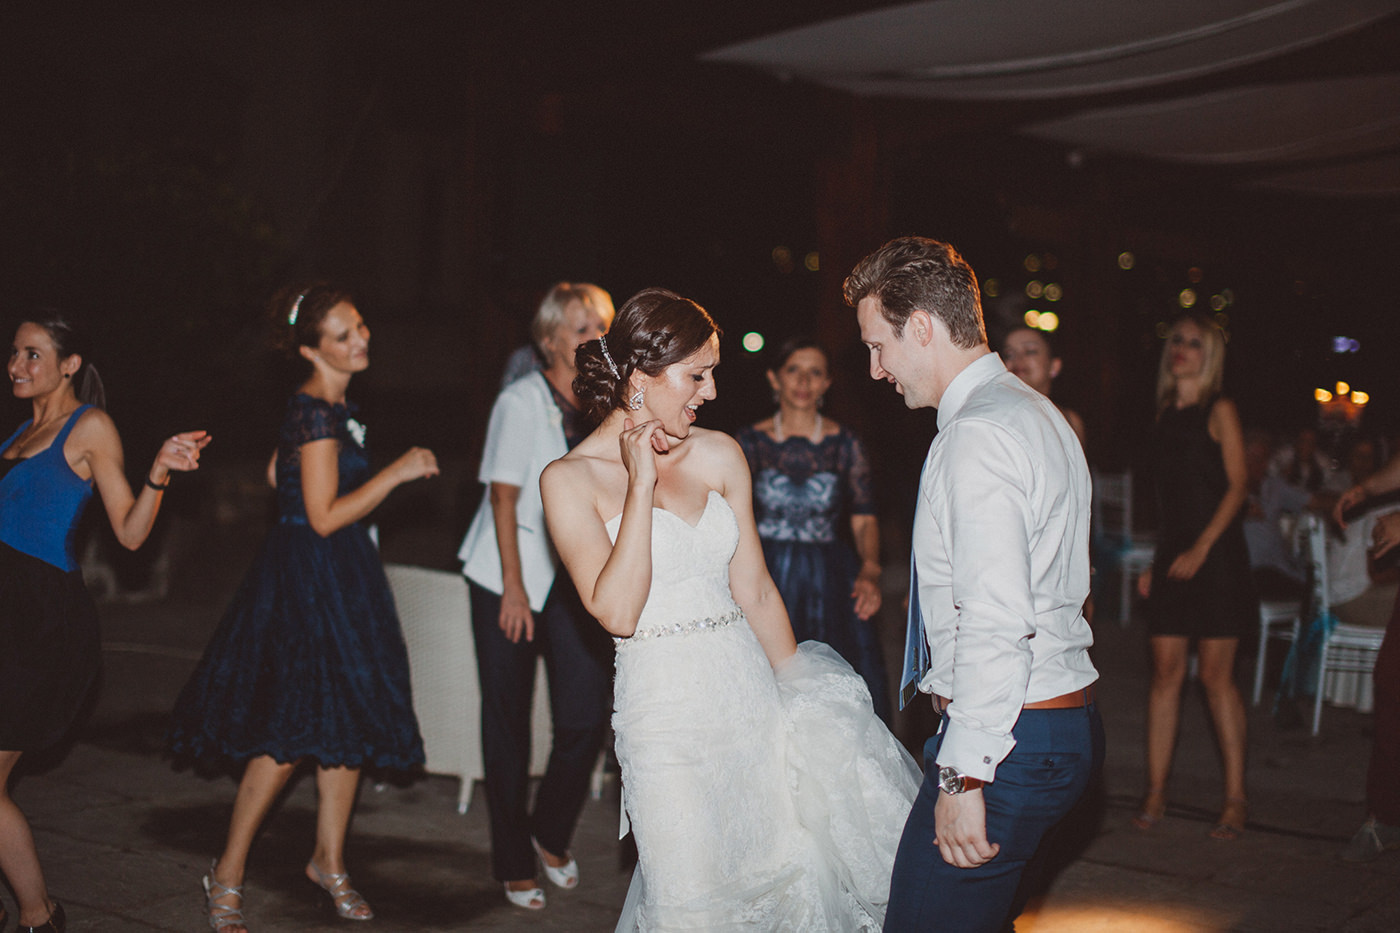 irena-ryan-destination-wedding-photographer-montenegro-kotor-0157